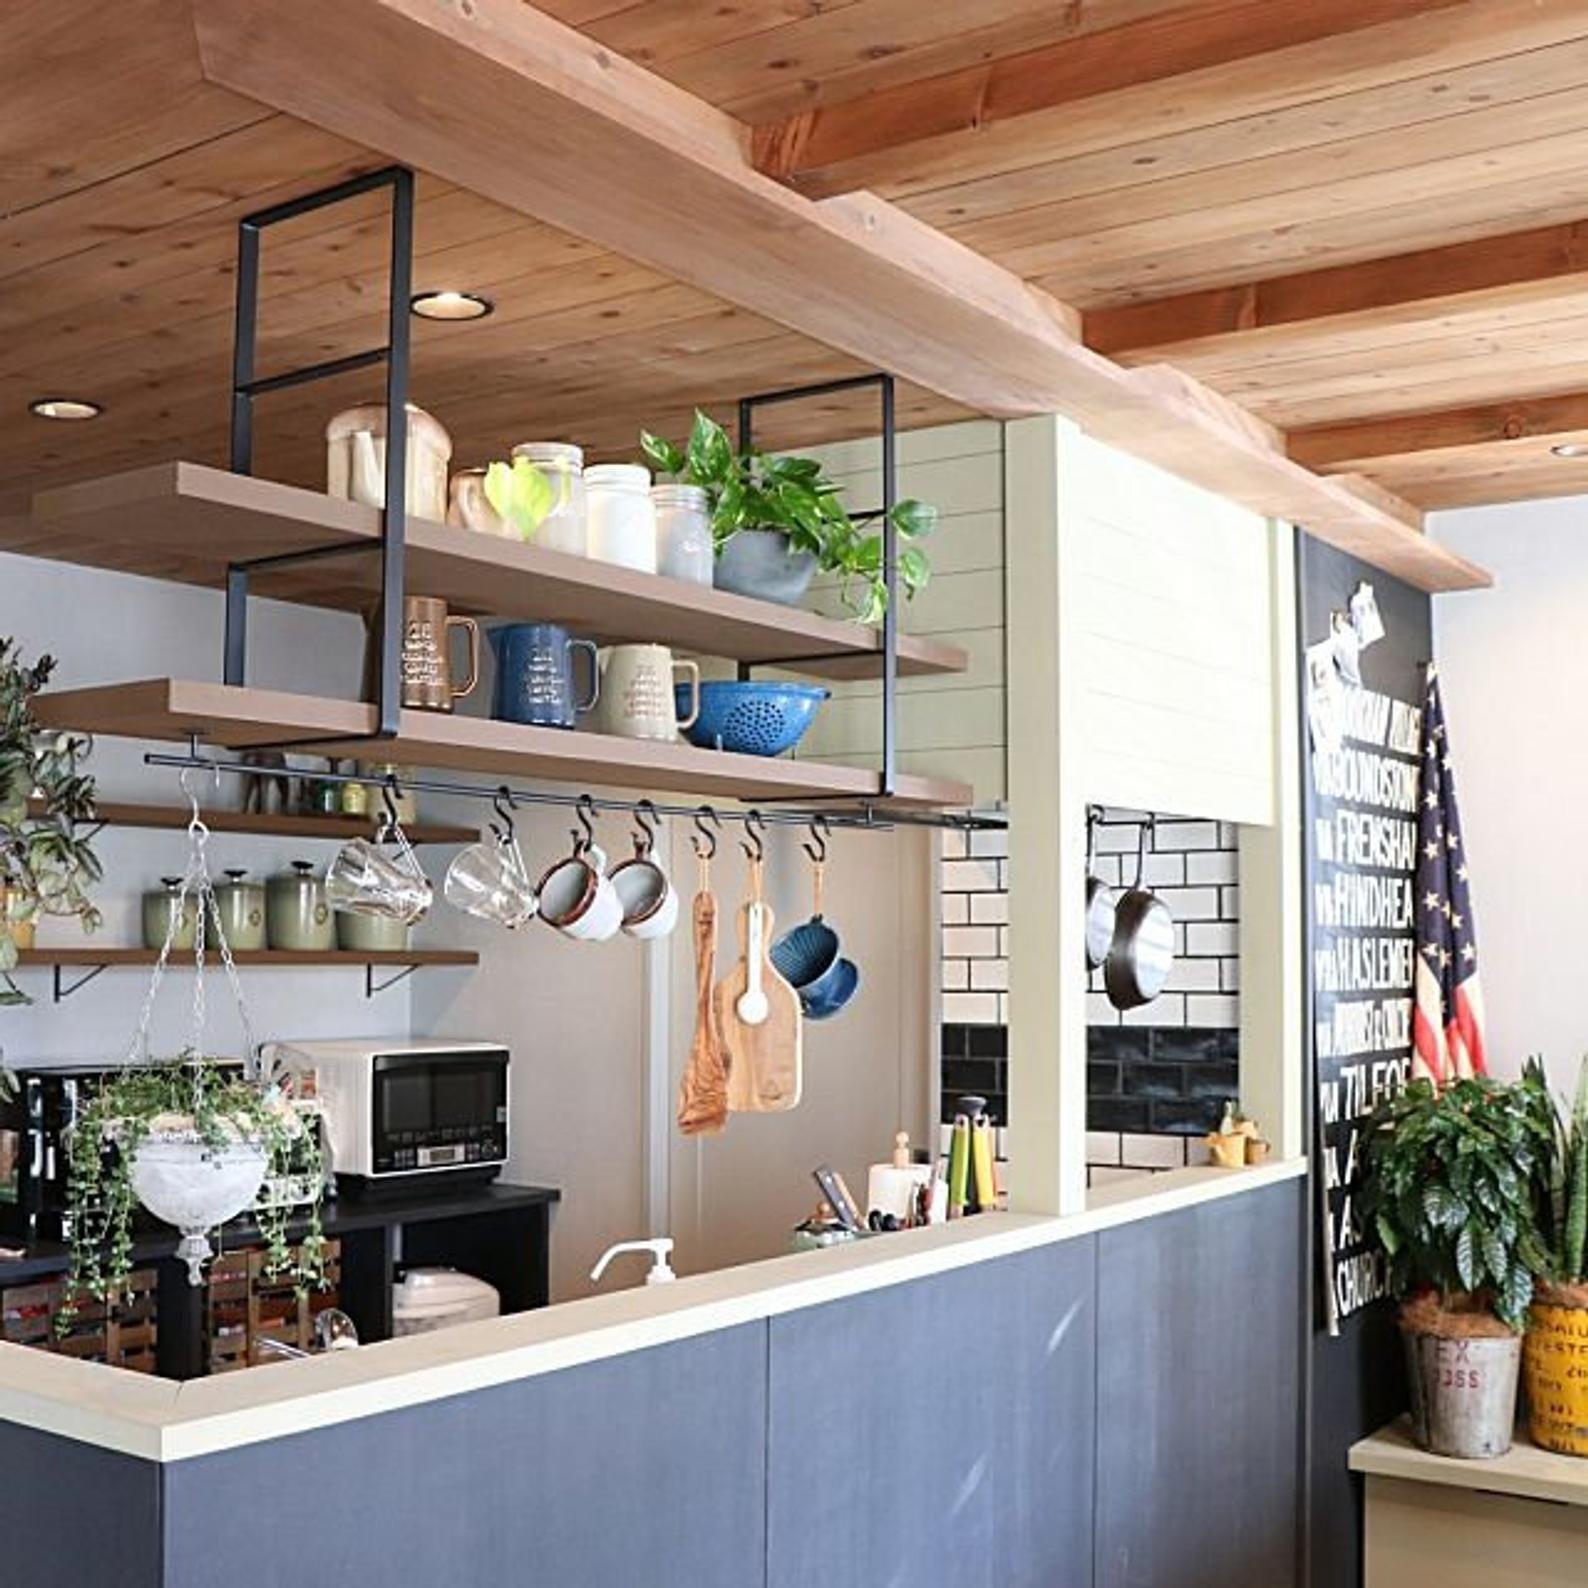 Floating ceiling bracket, hanging shelf in 2020 Kitchen